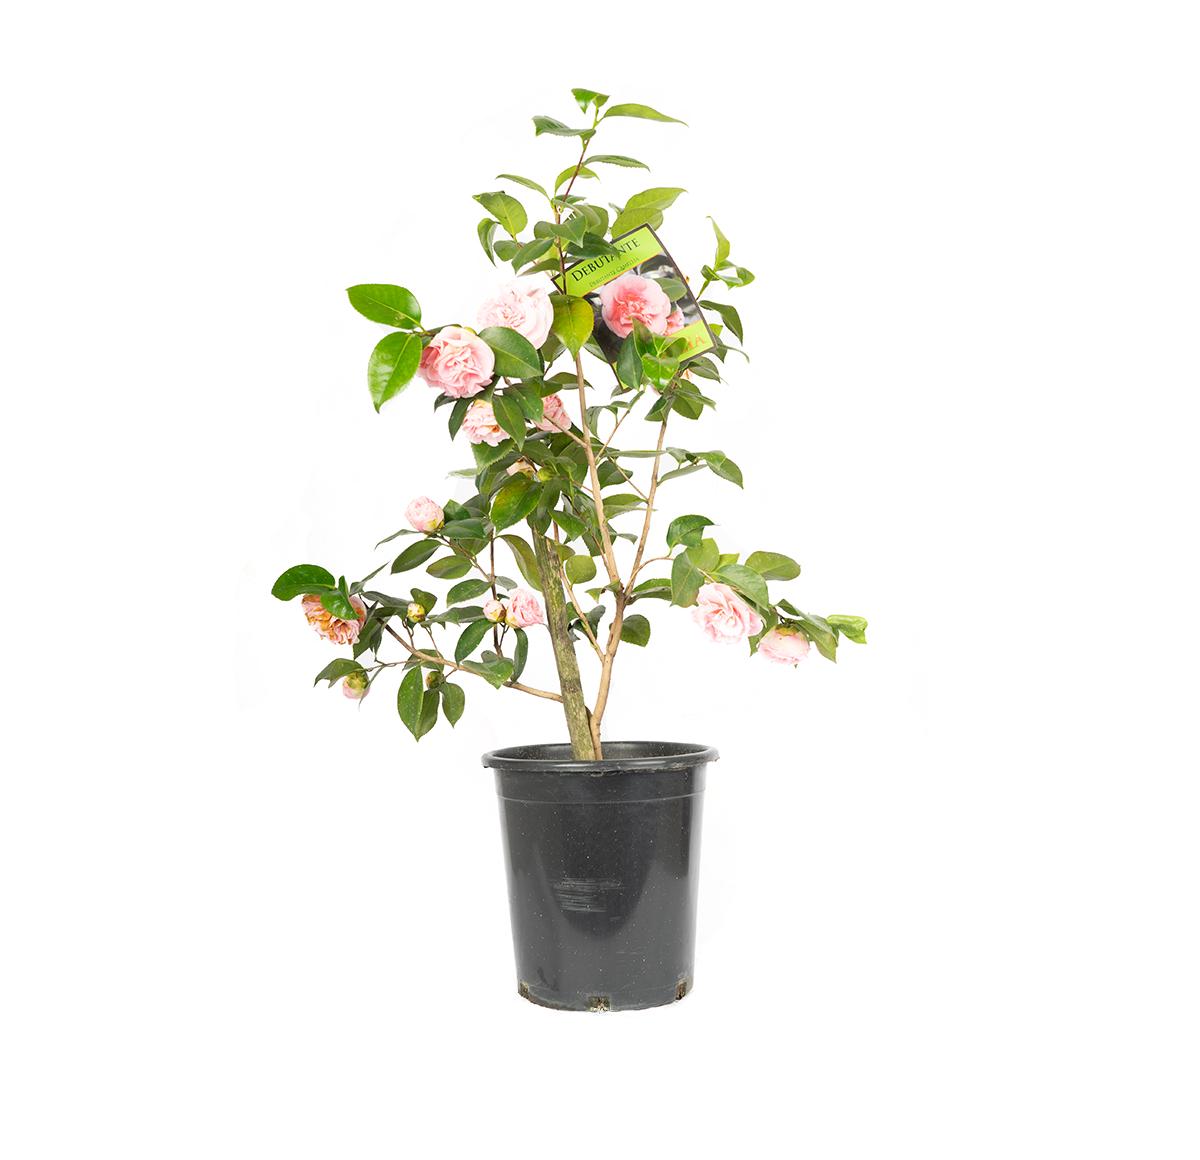 Debutante Camellia in a black nursery container